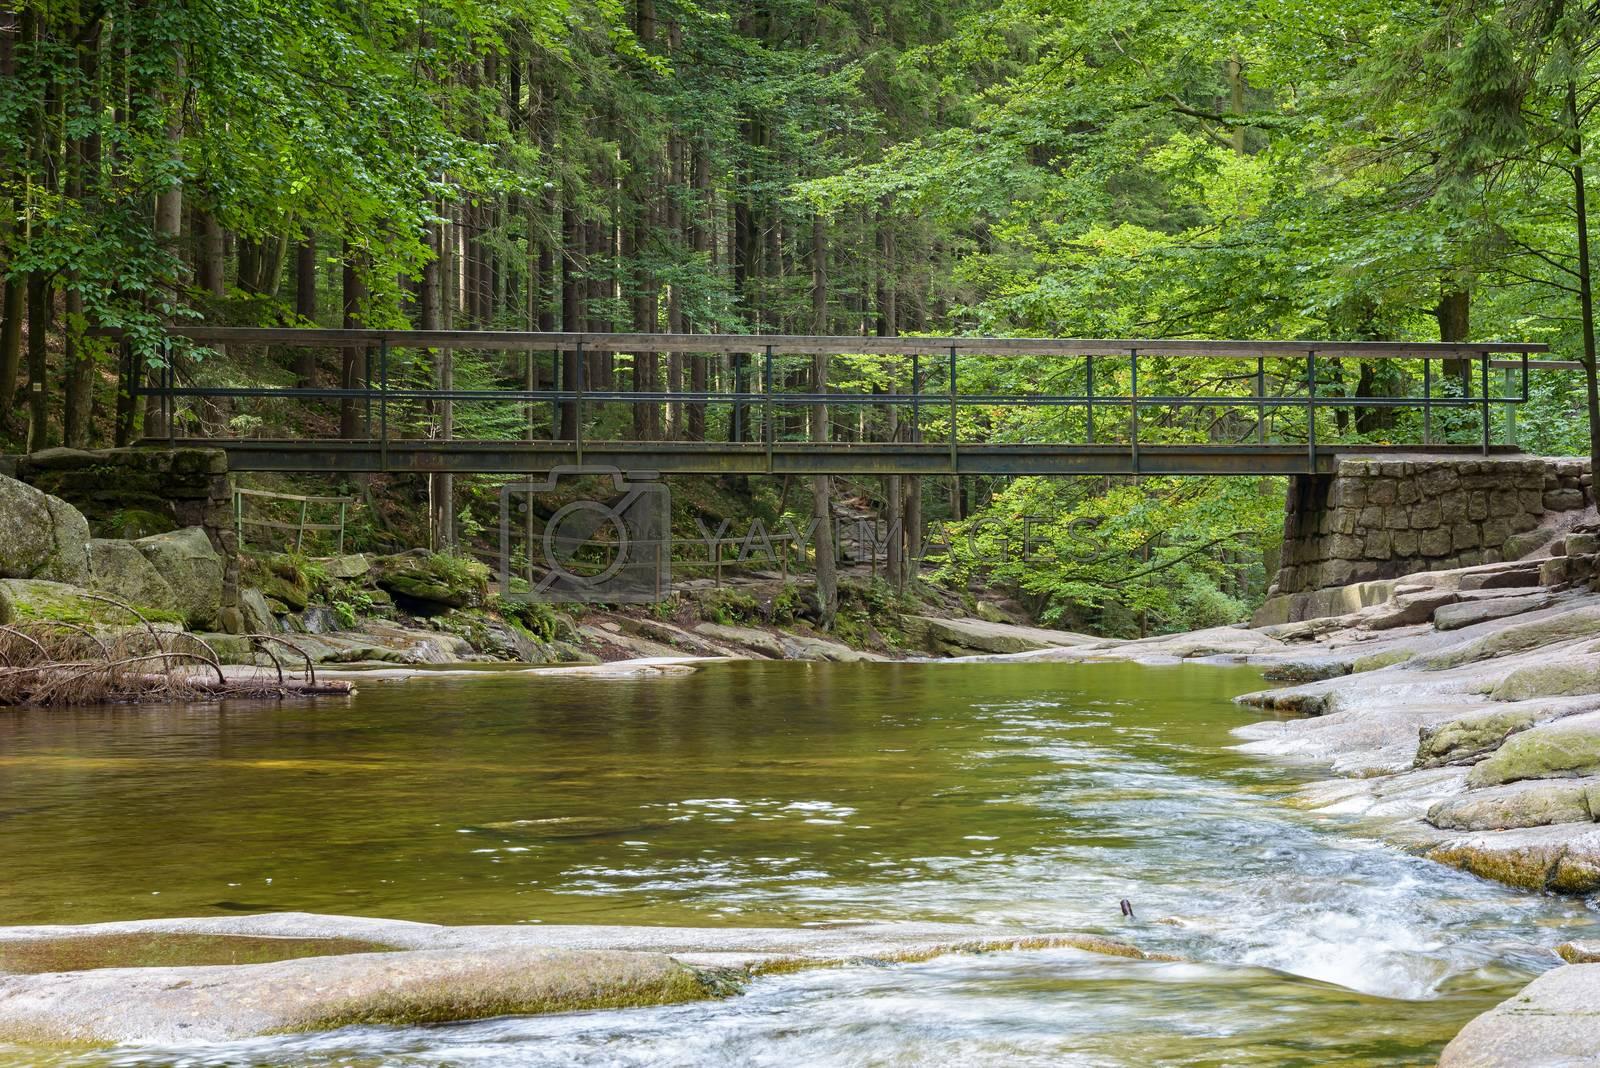 Bridge over the Mumlava river near Harrachov in Czech Giant Mountains